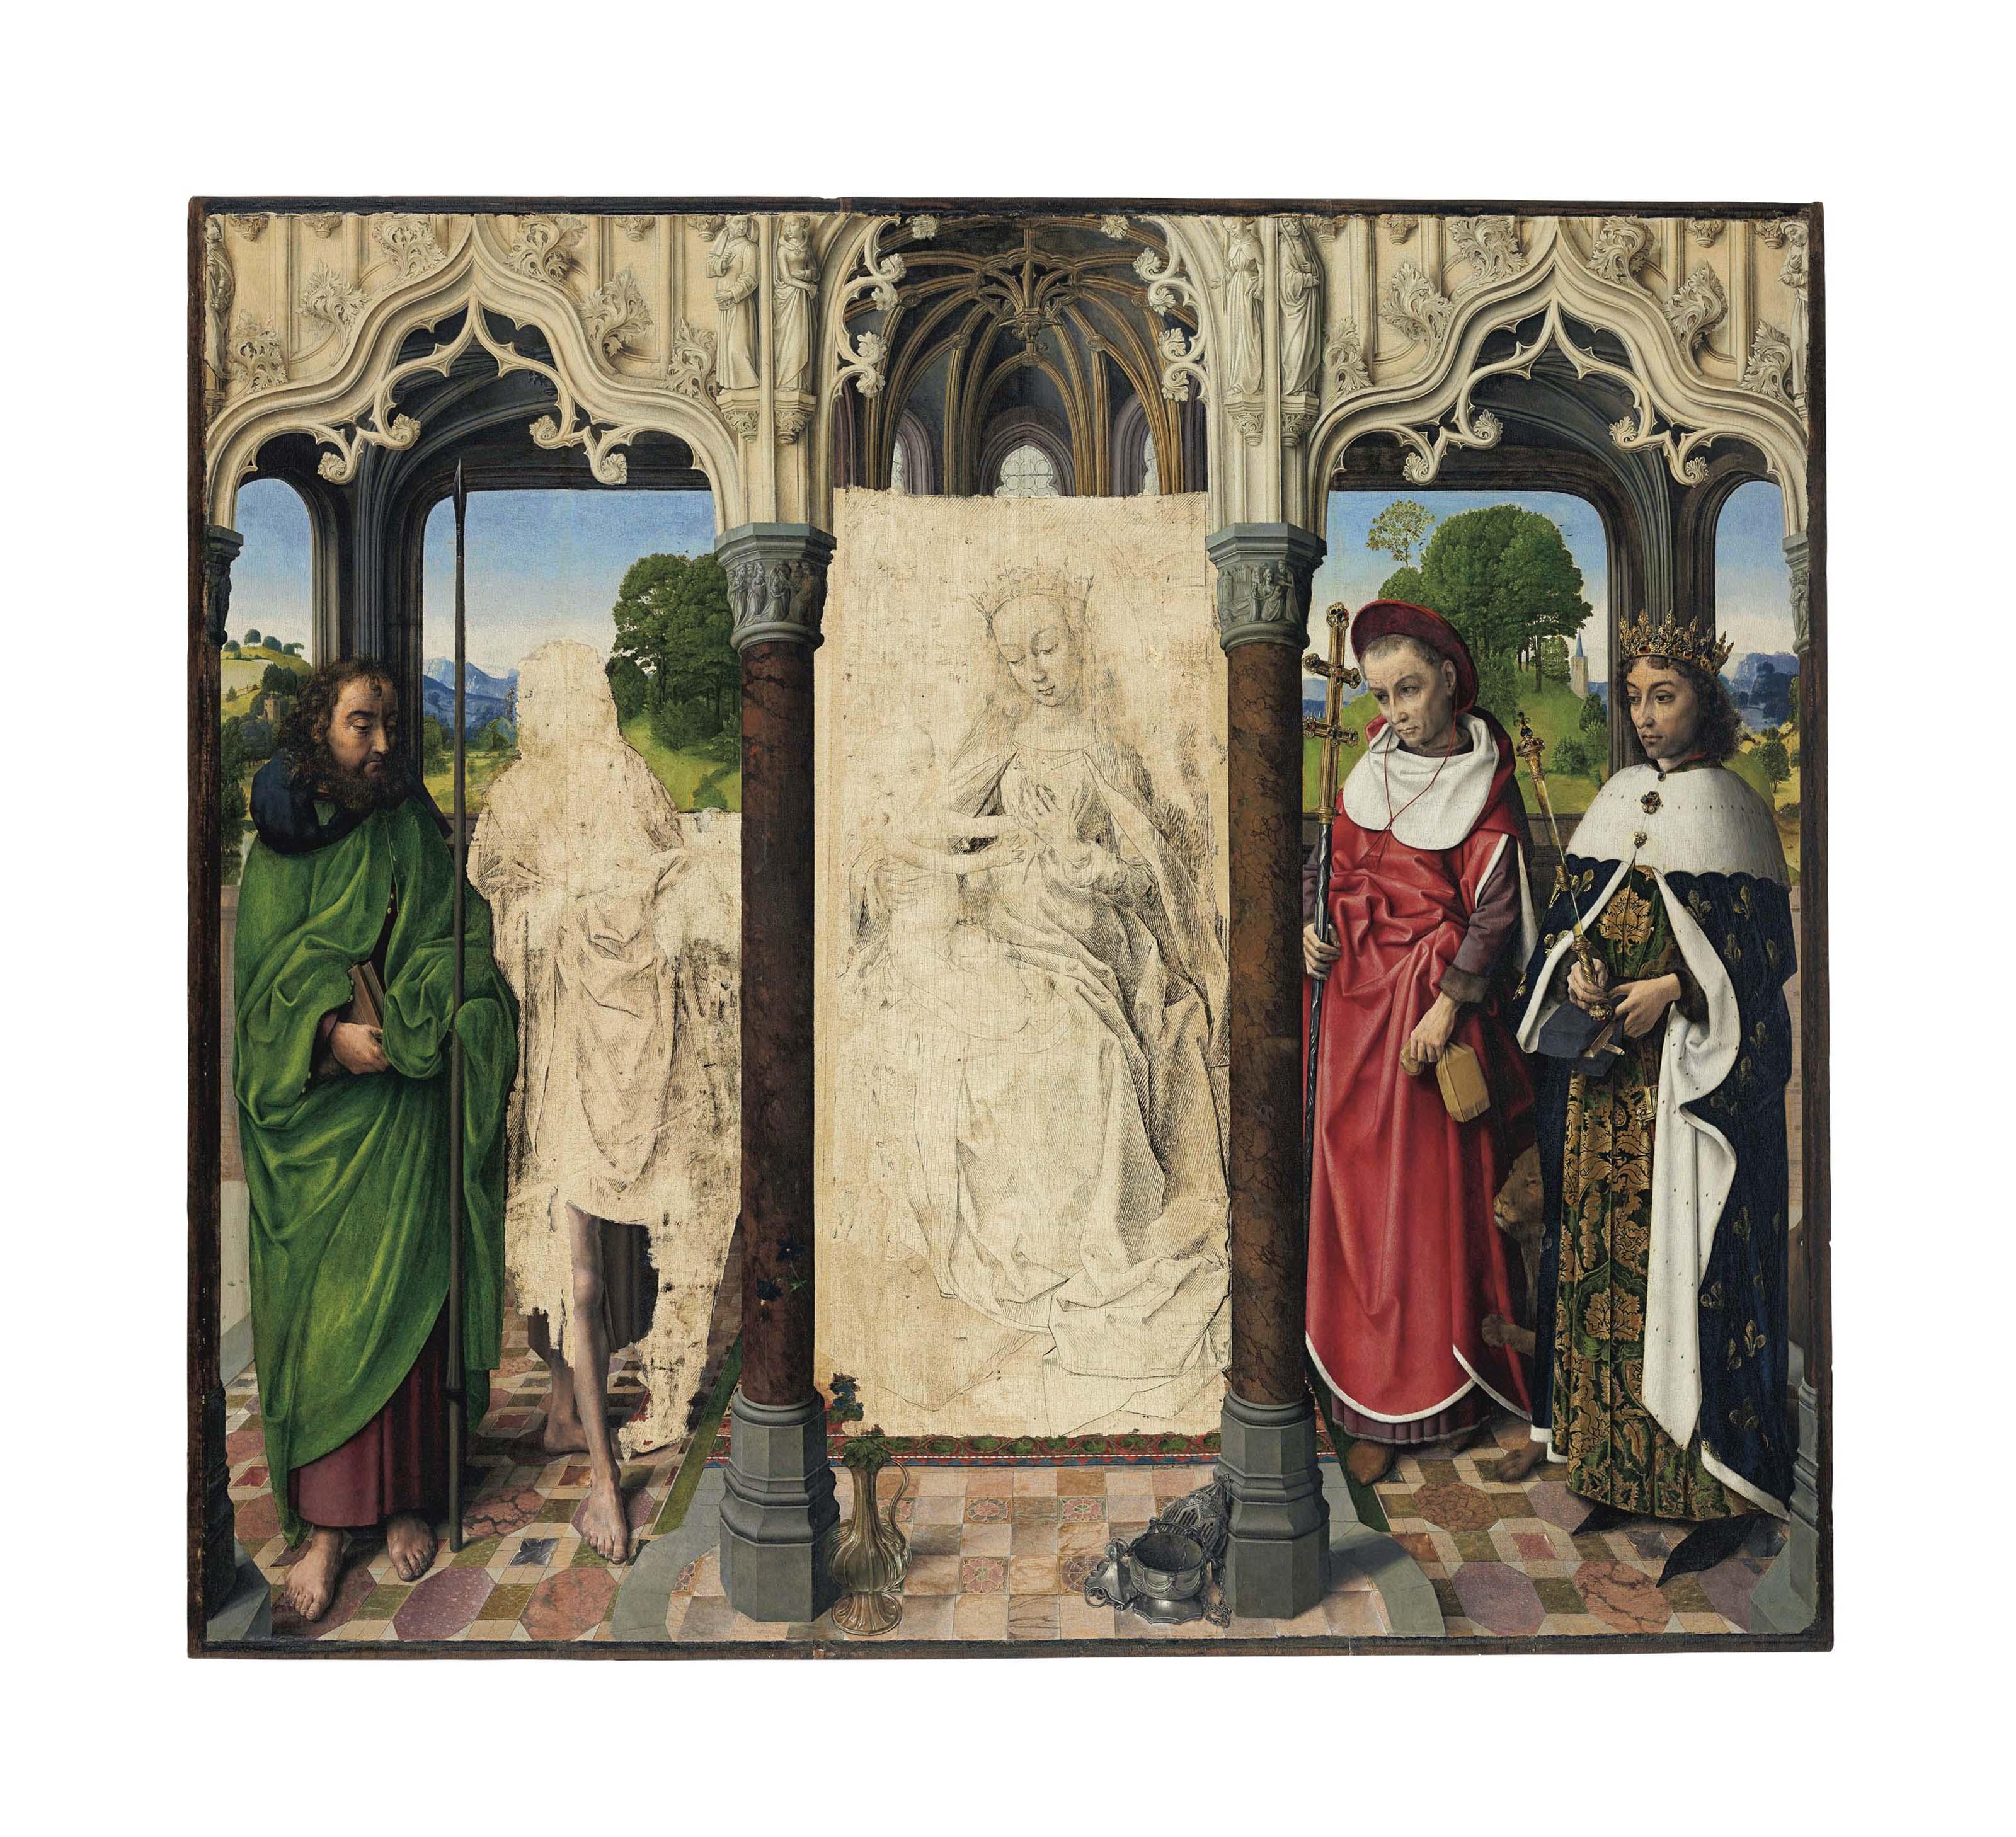 Attributed to Hugo van der Goes (Ghent c. 1440-1482 Rode Klooster, near Brussels)